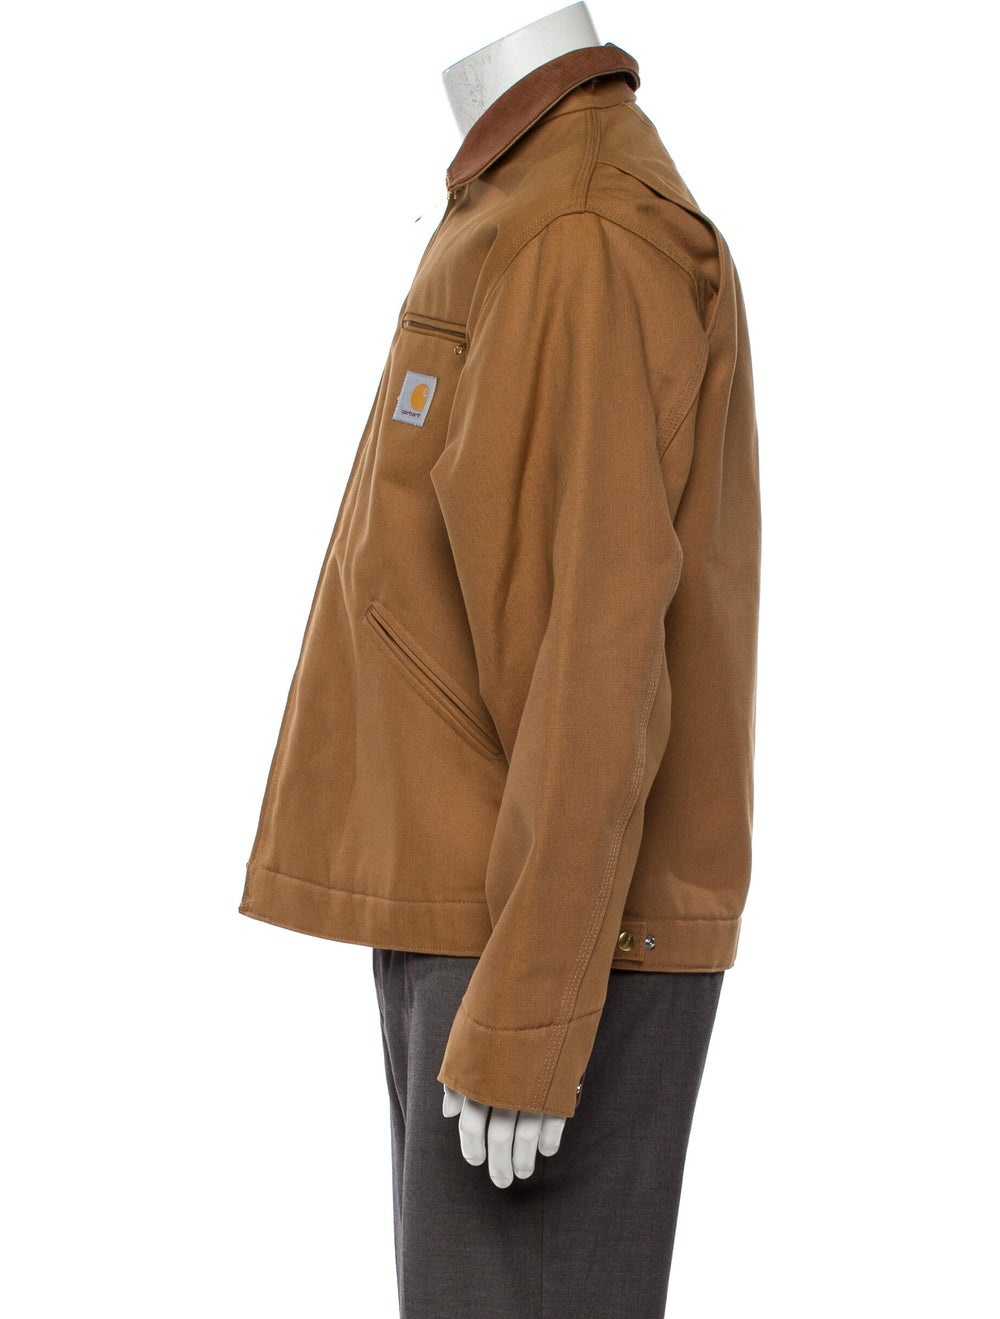 Carhartt Jacket - image 2